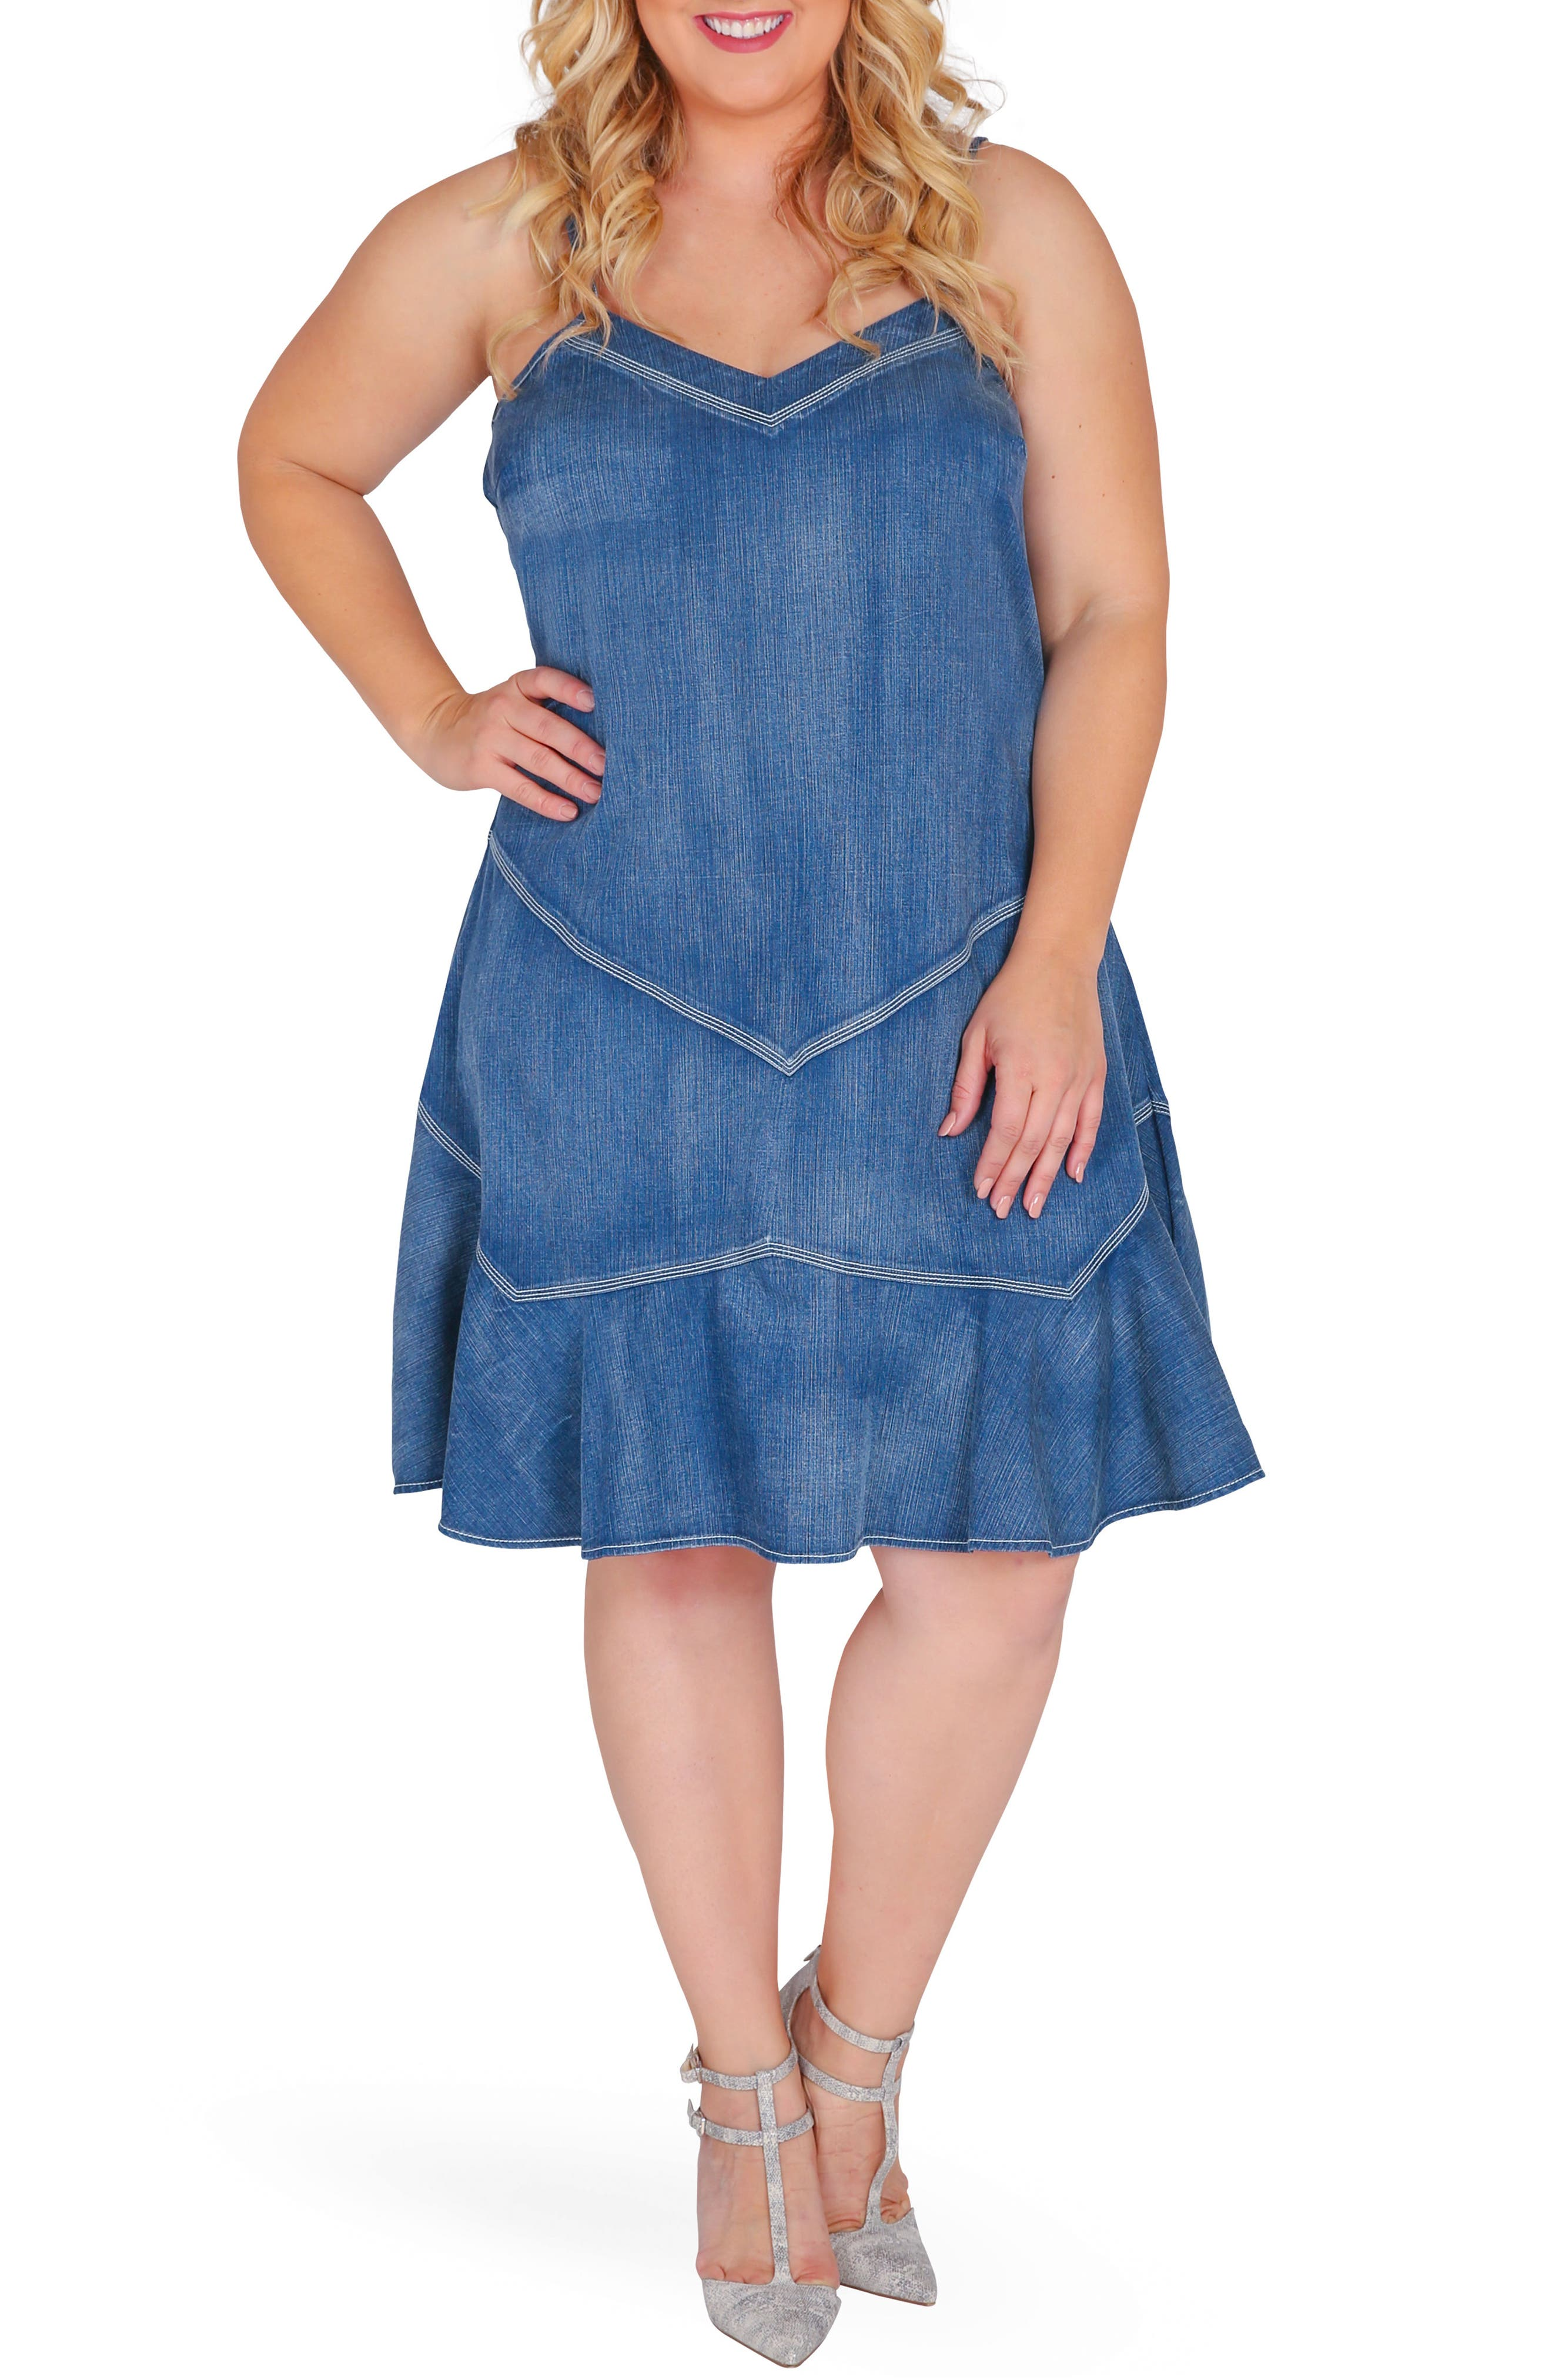 Plus Size Standards & Practices Rosie Denim Tank Dress